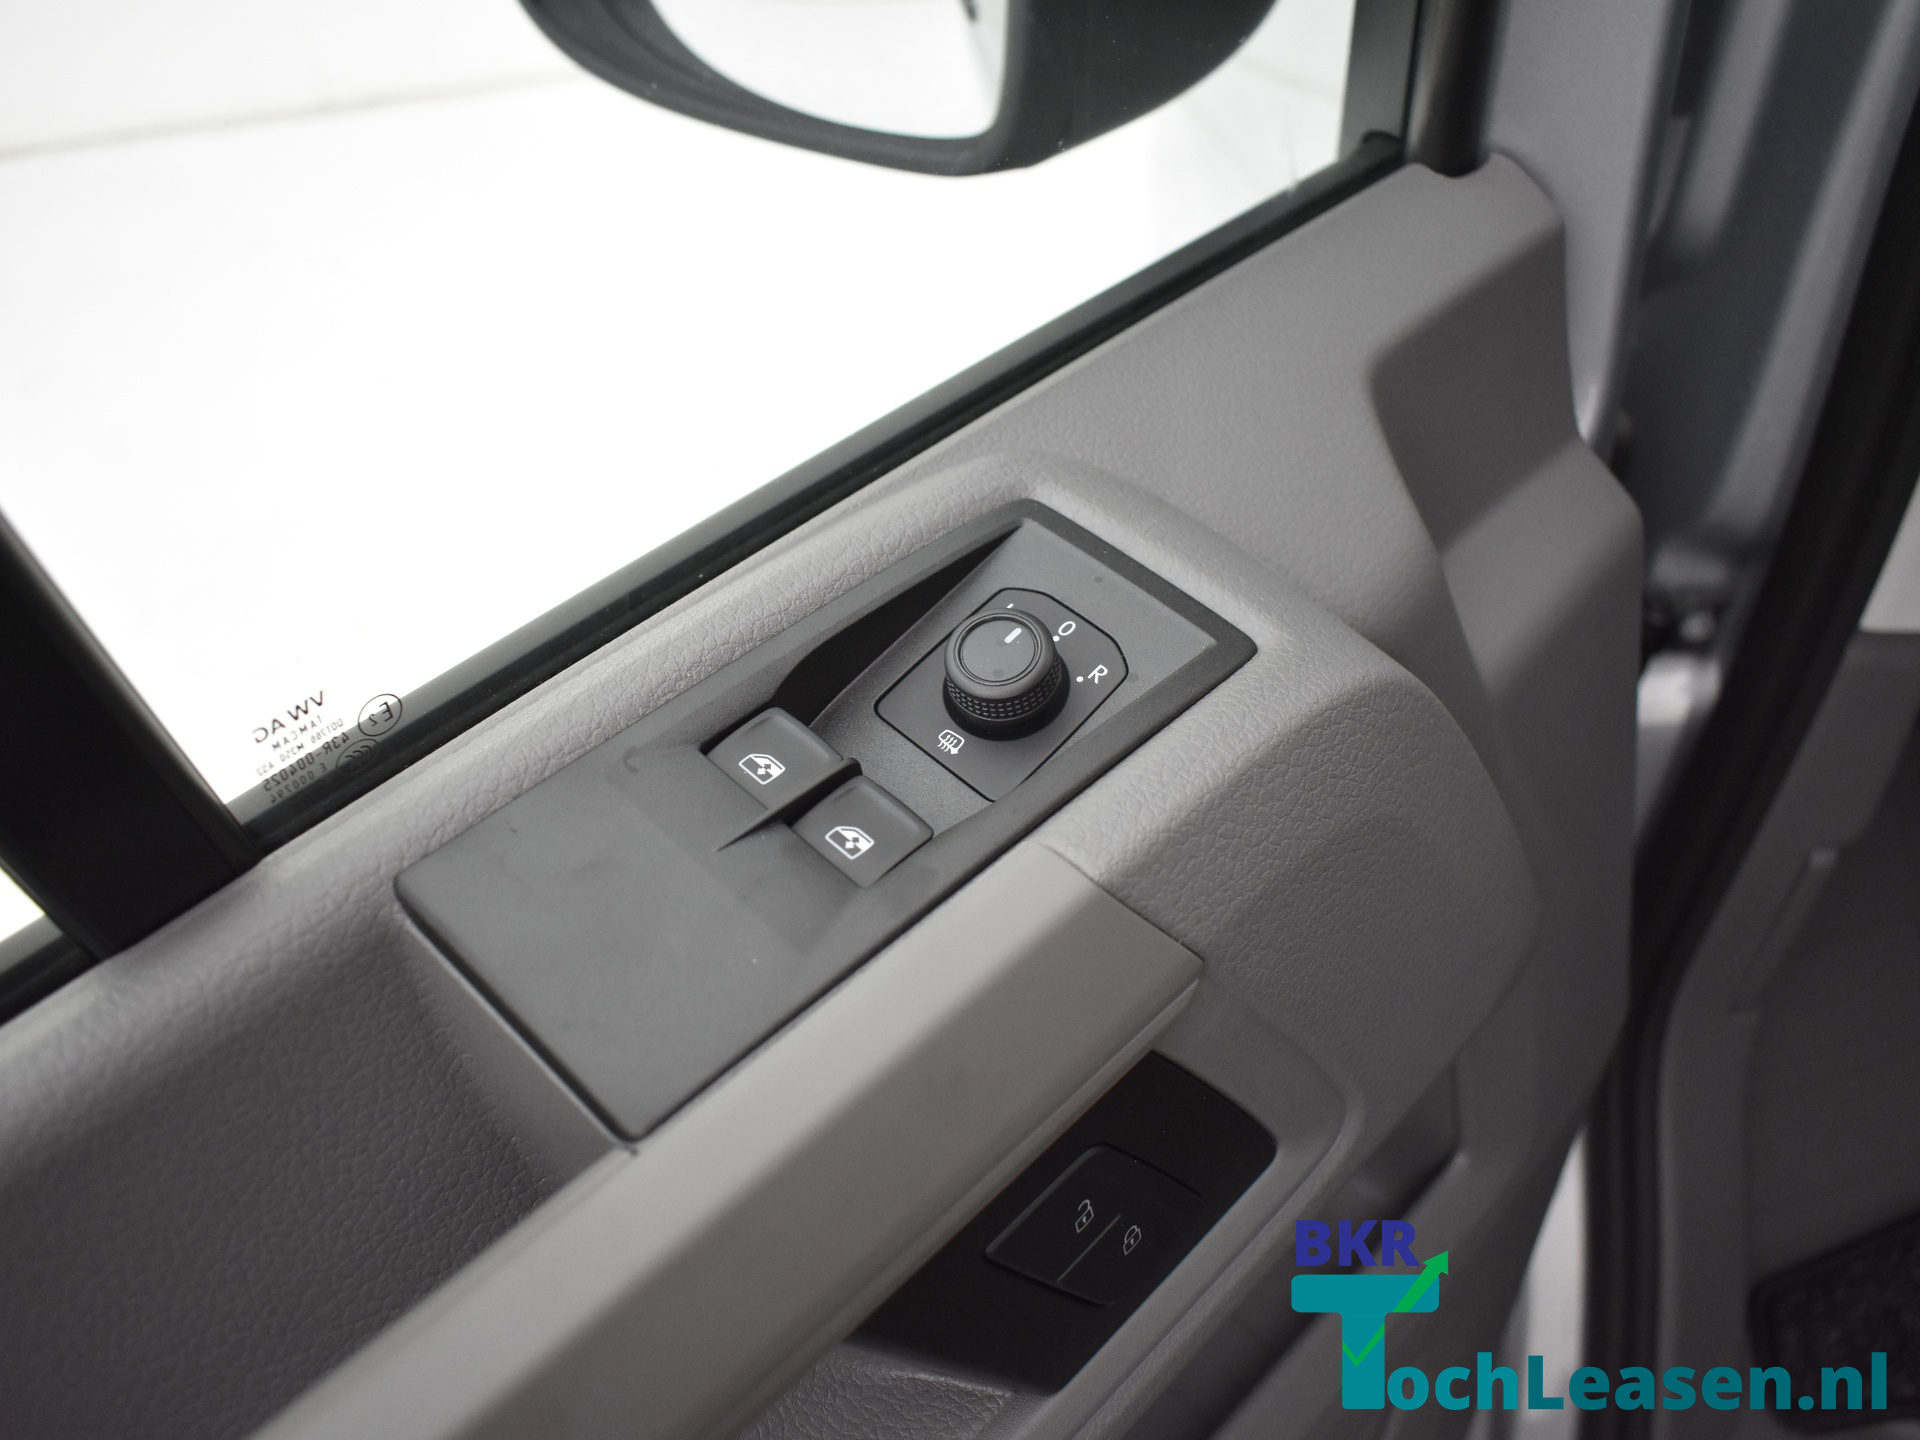 Volkswagen Crafter zilver L3H3 Automaat bkr toch leasen